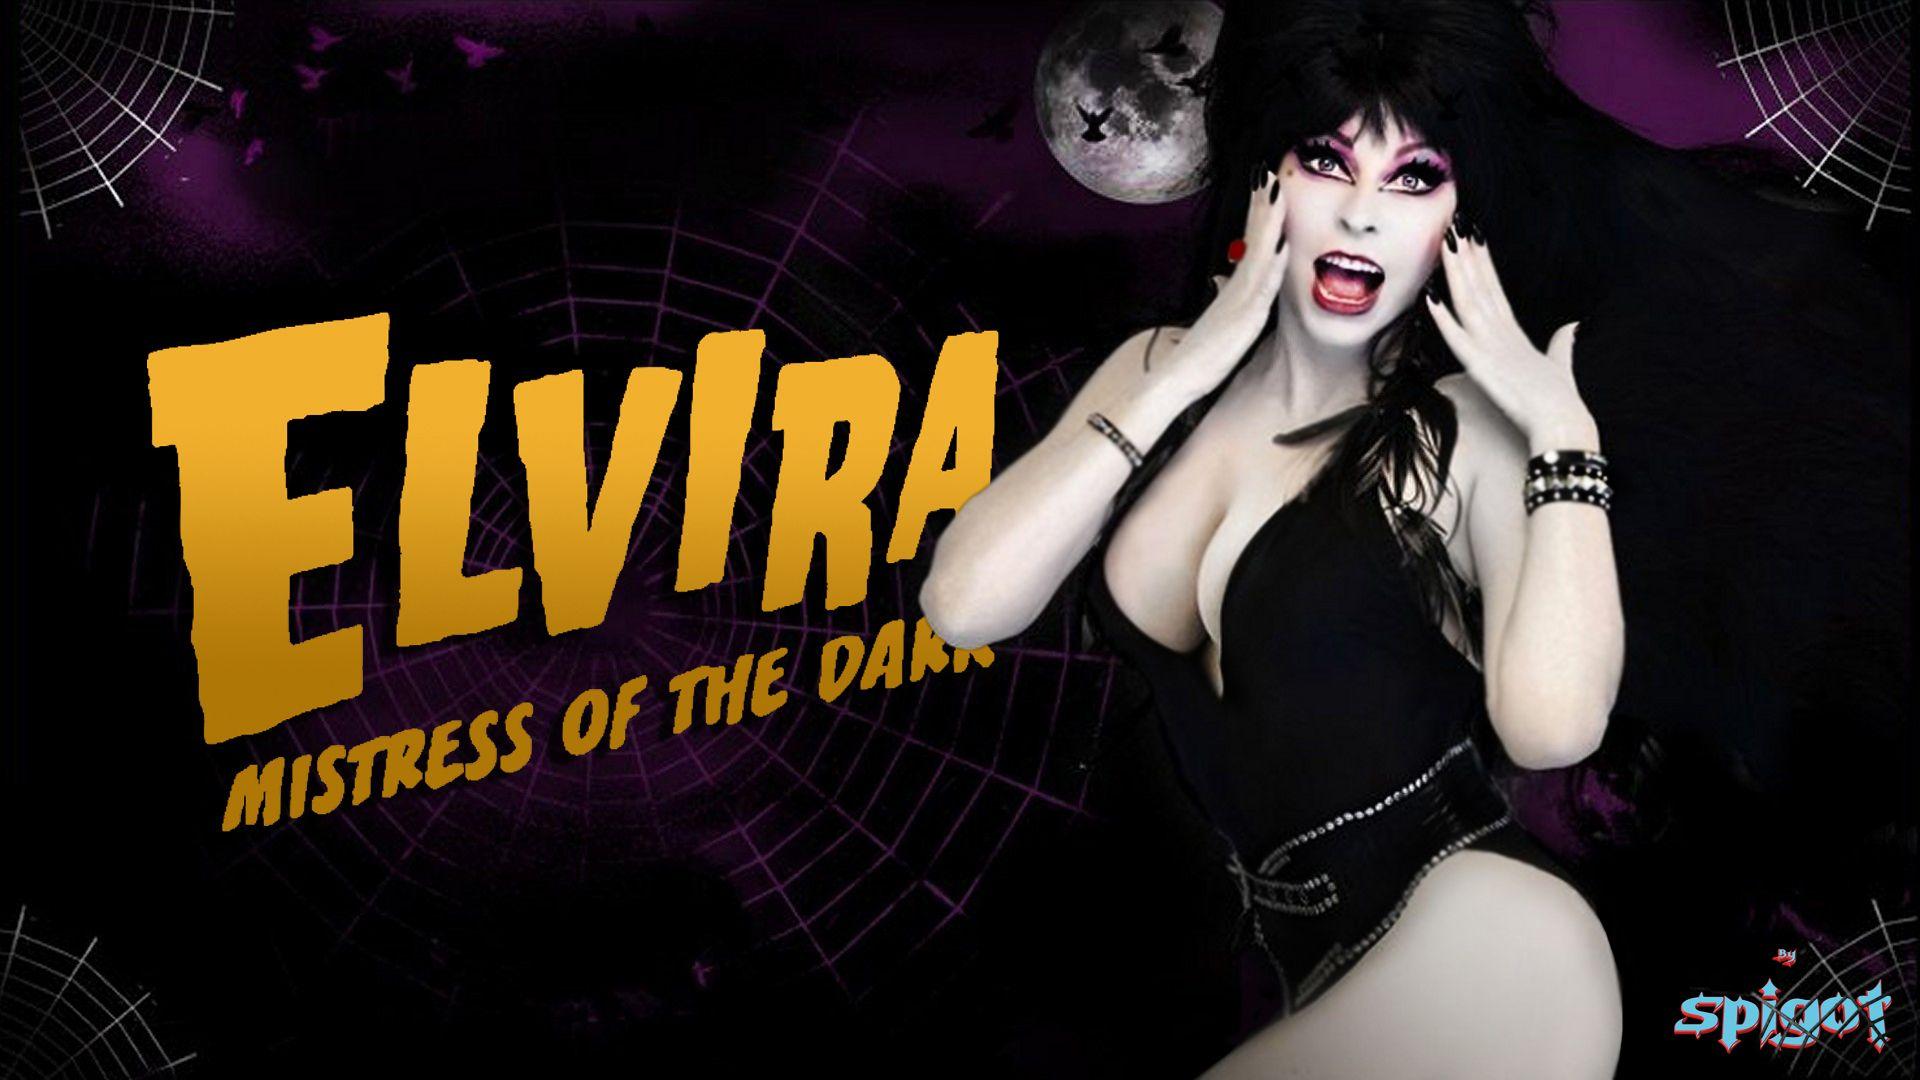 Elvira Wallpaper Cassandra Peterson Mistress Classic Movies